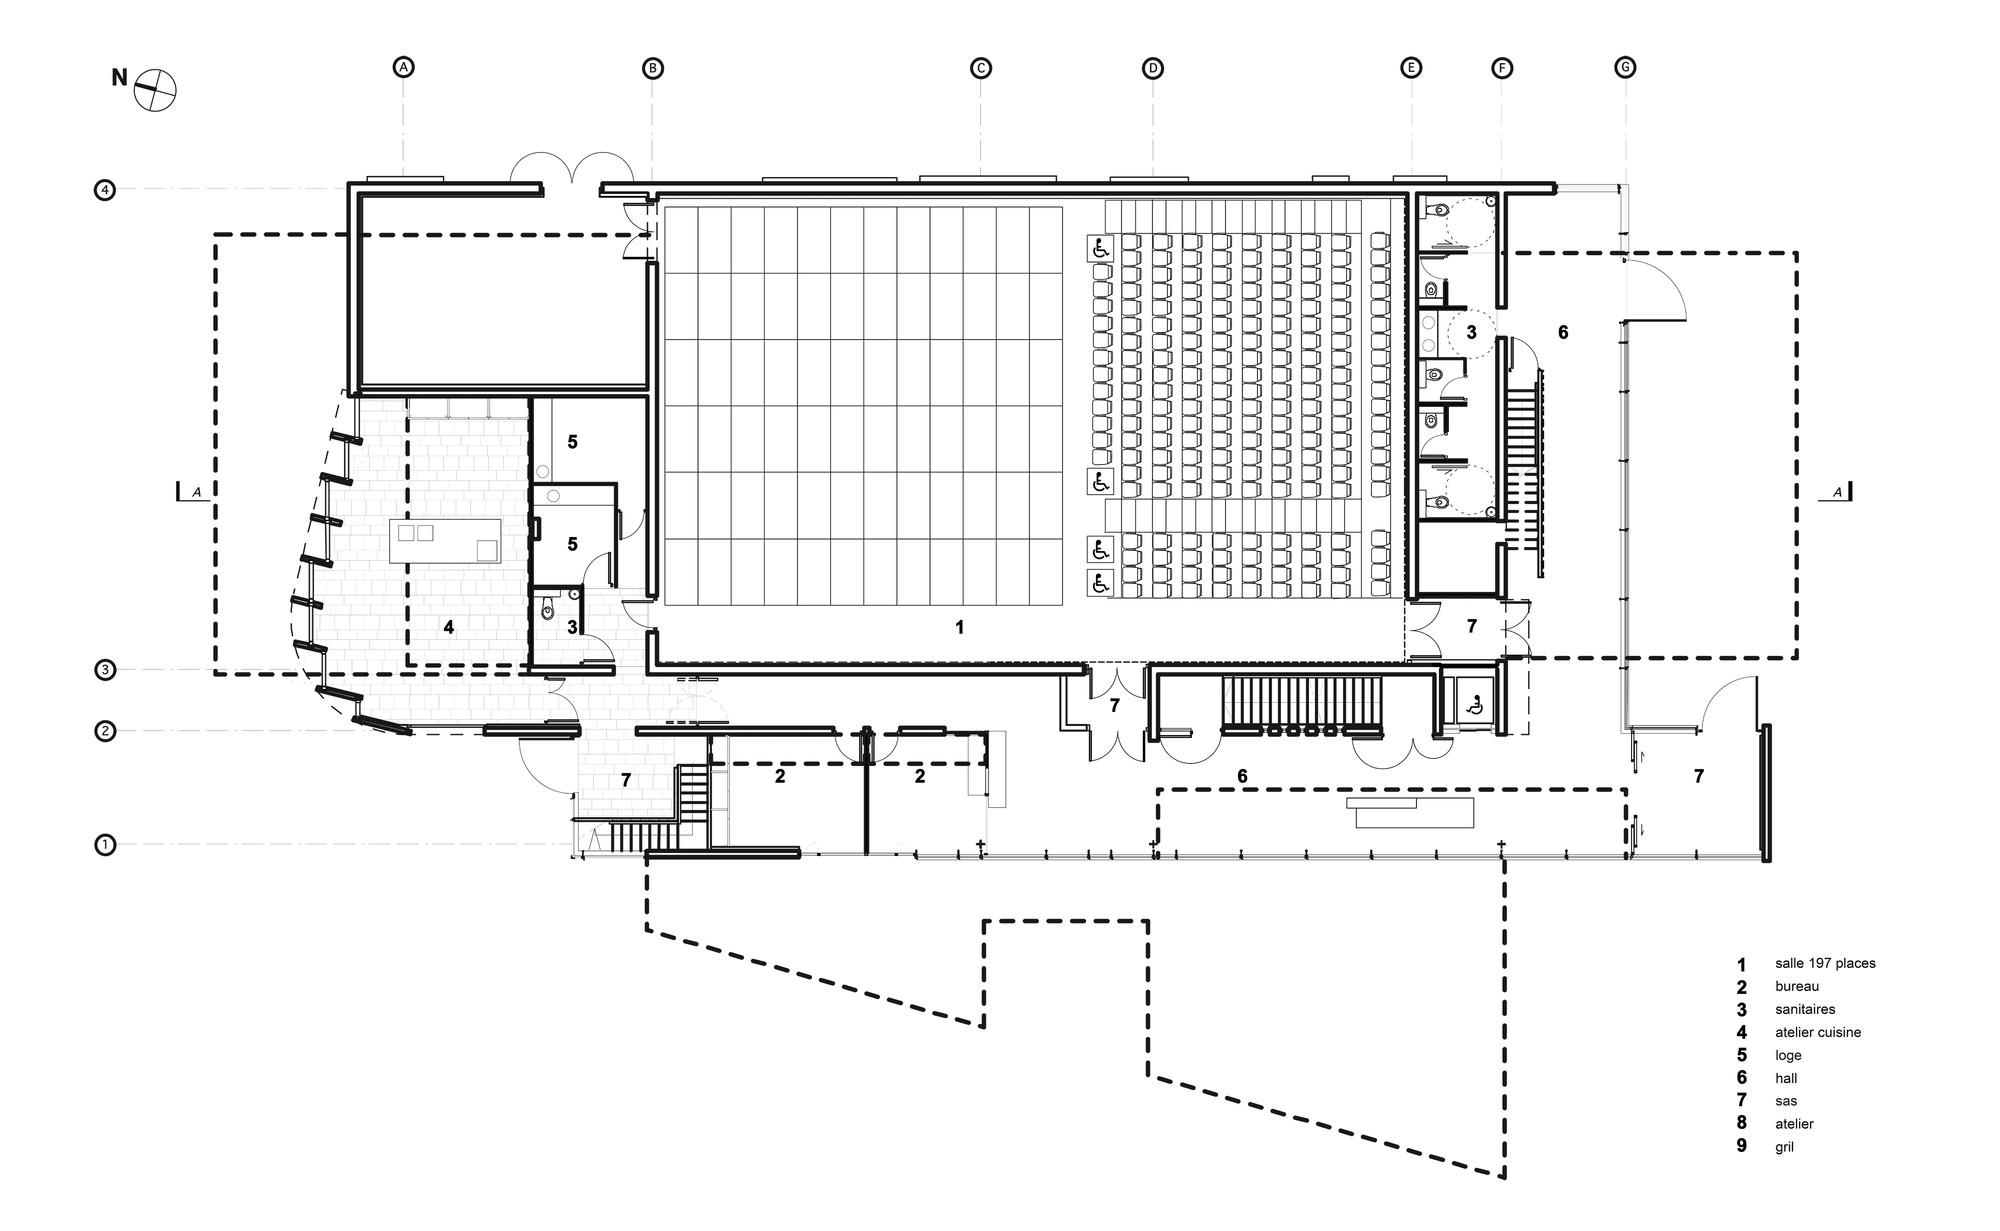 Galeria De Centro Cultural Sedan Richard Schoeller